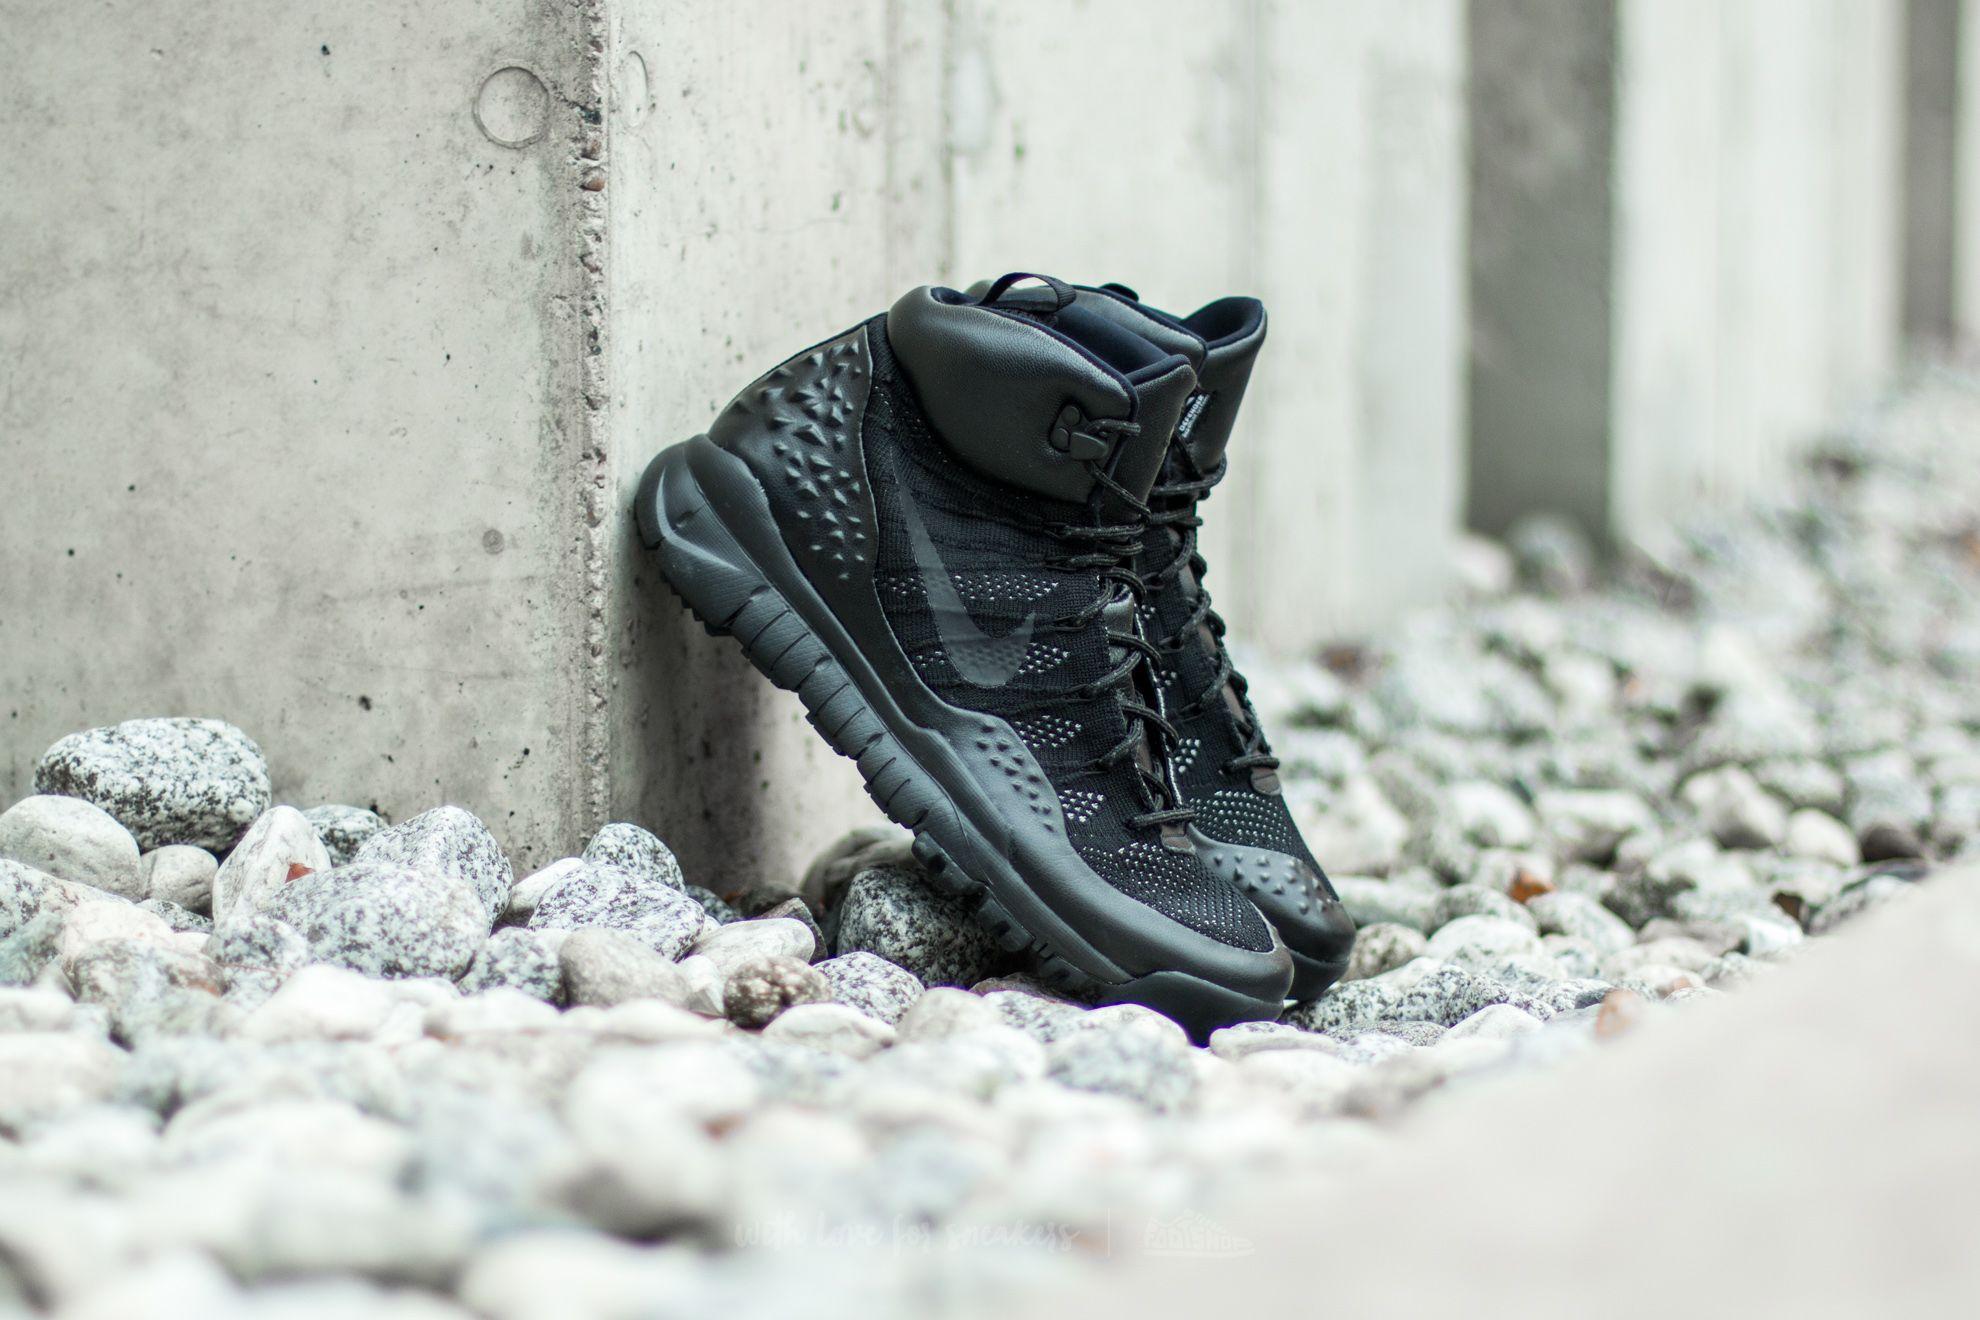 Nike Lupinek Flyknit Black/ Black-Anthracite